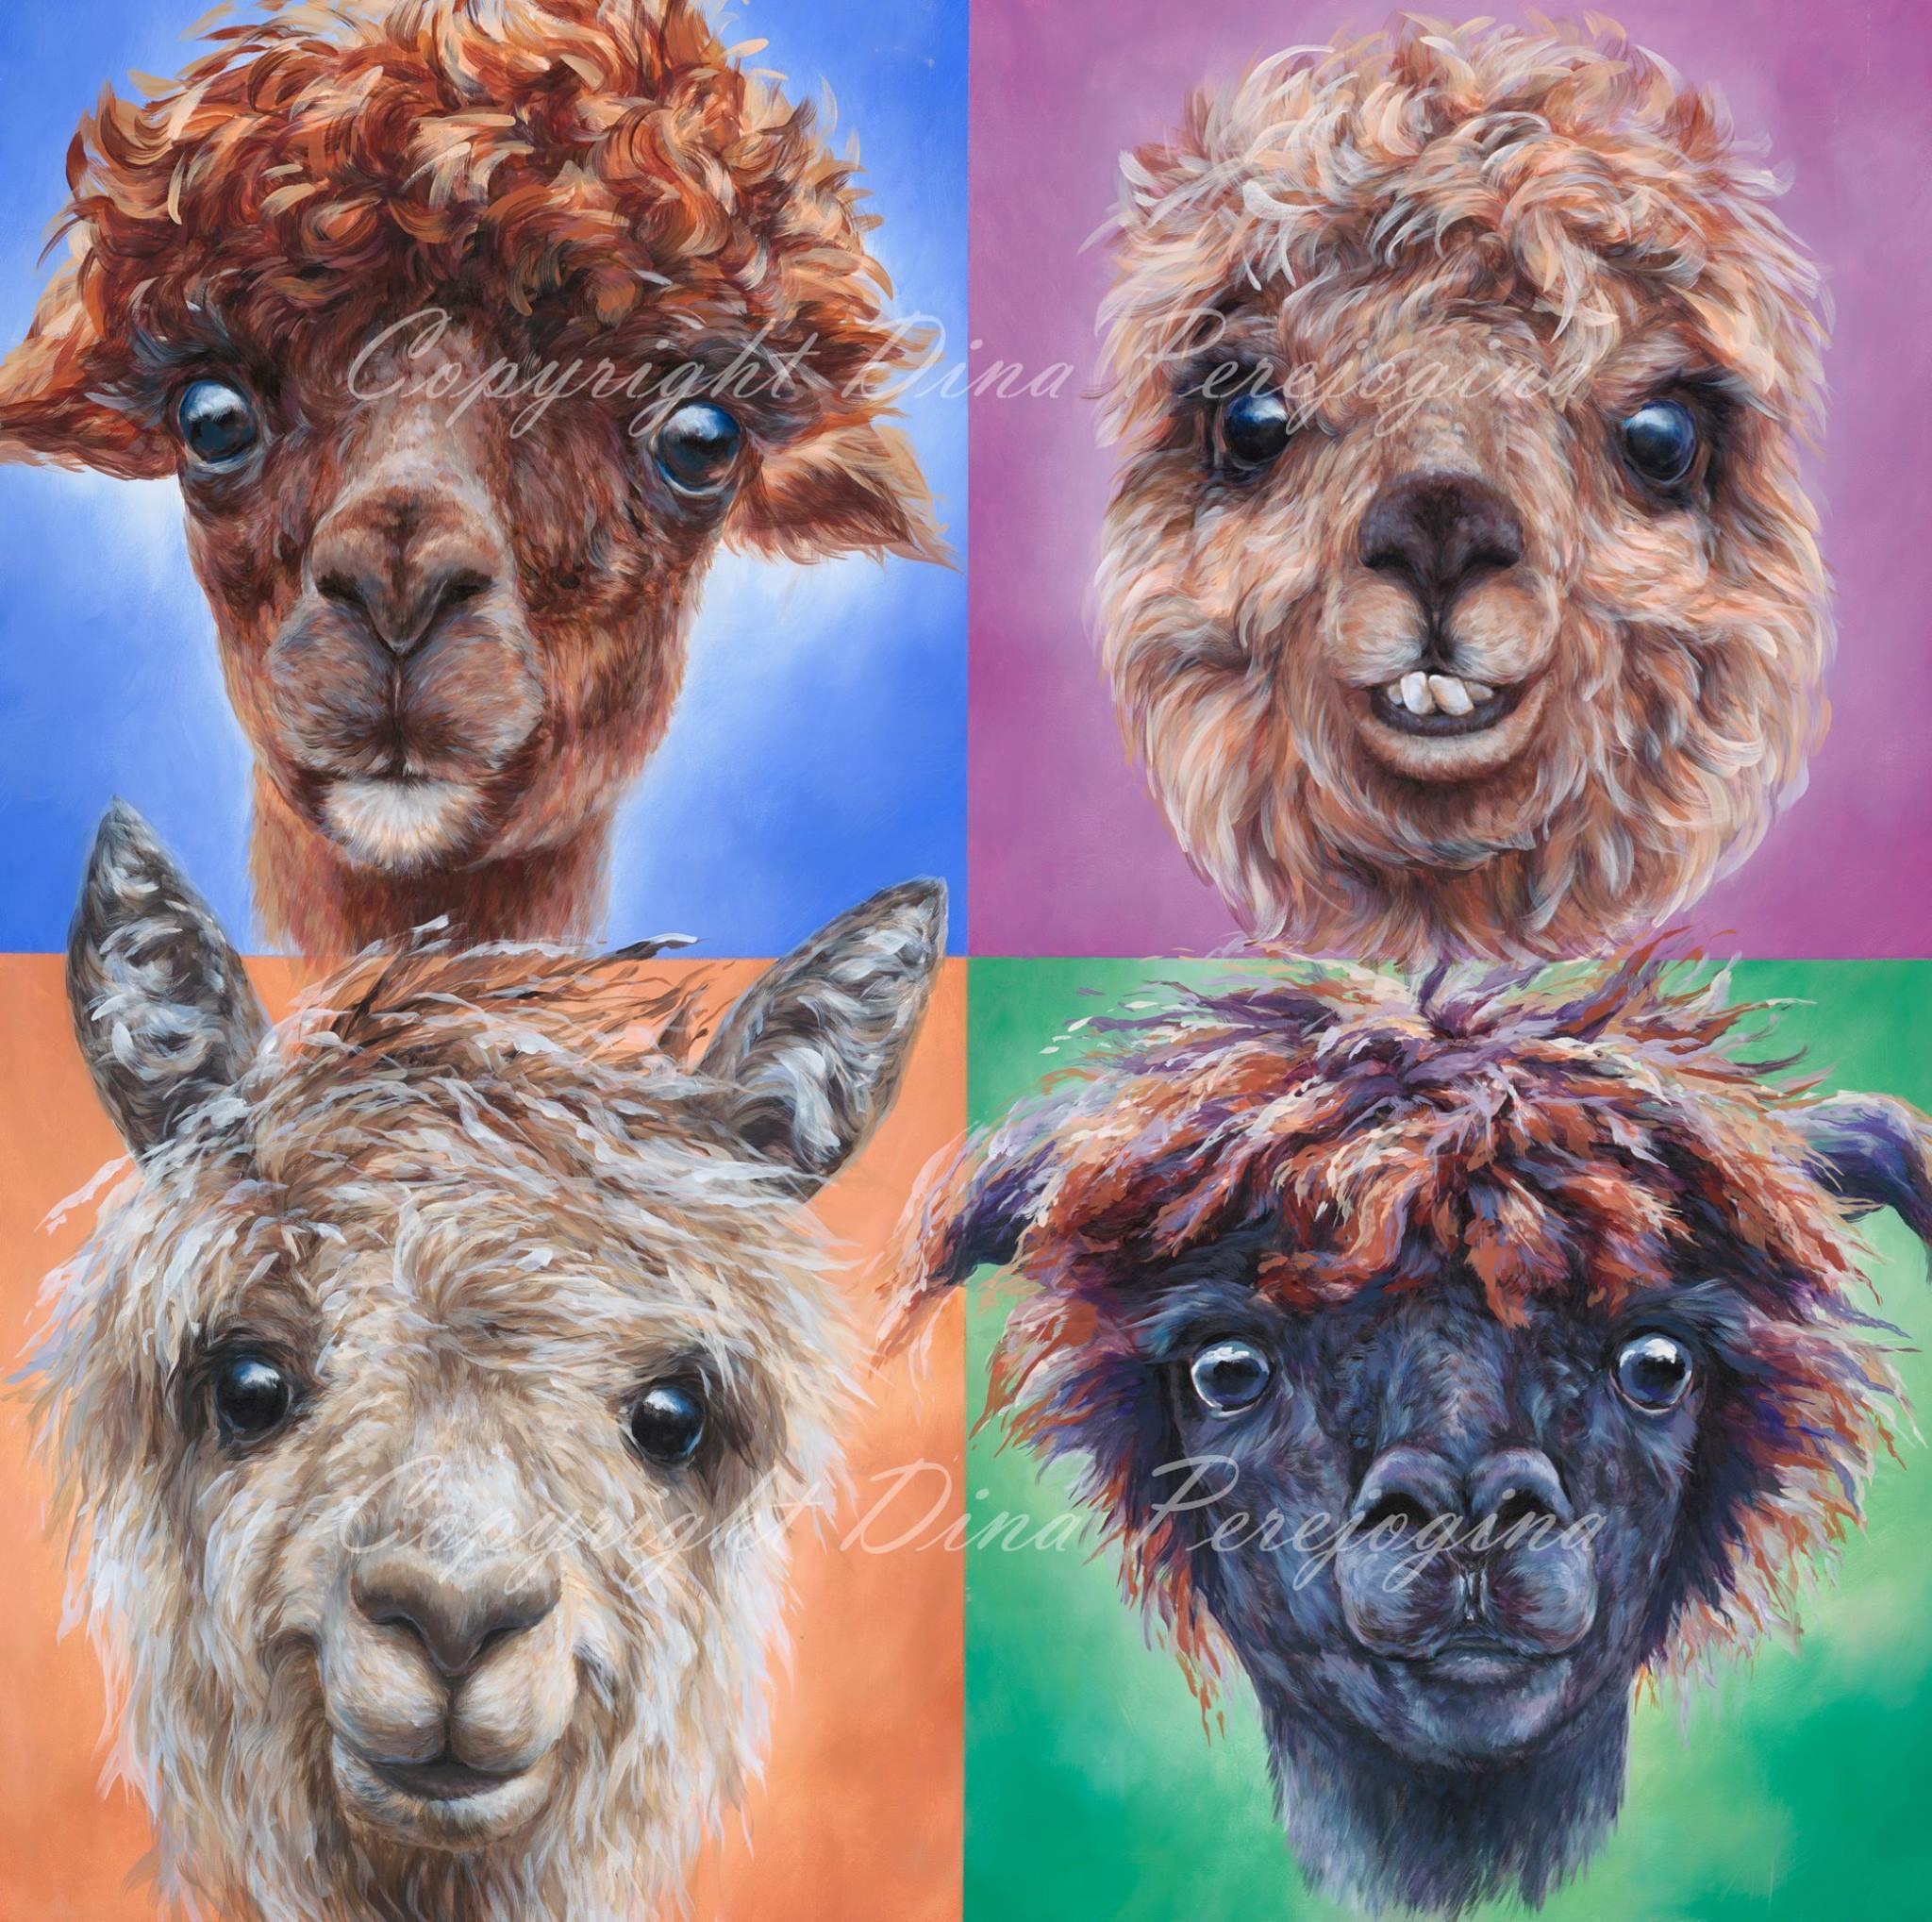 'Alpacas'